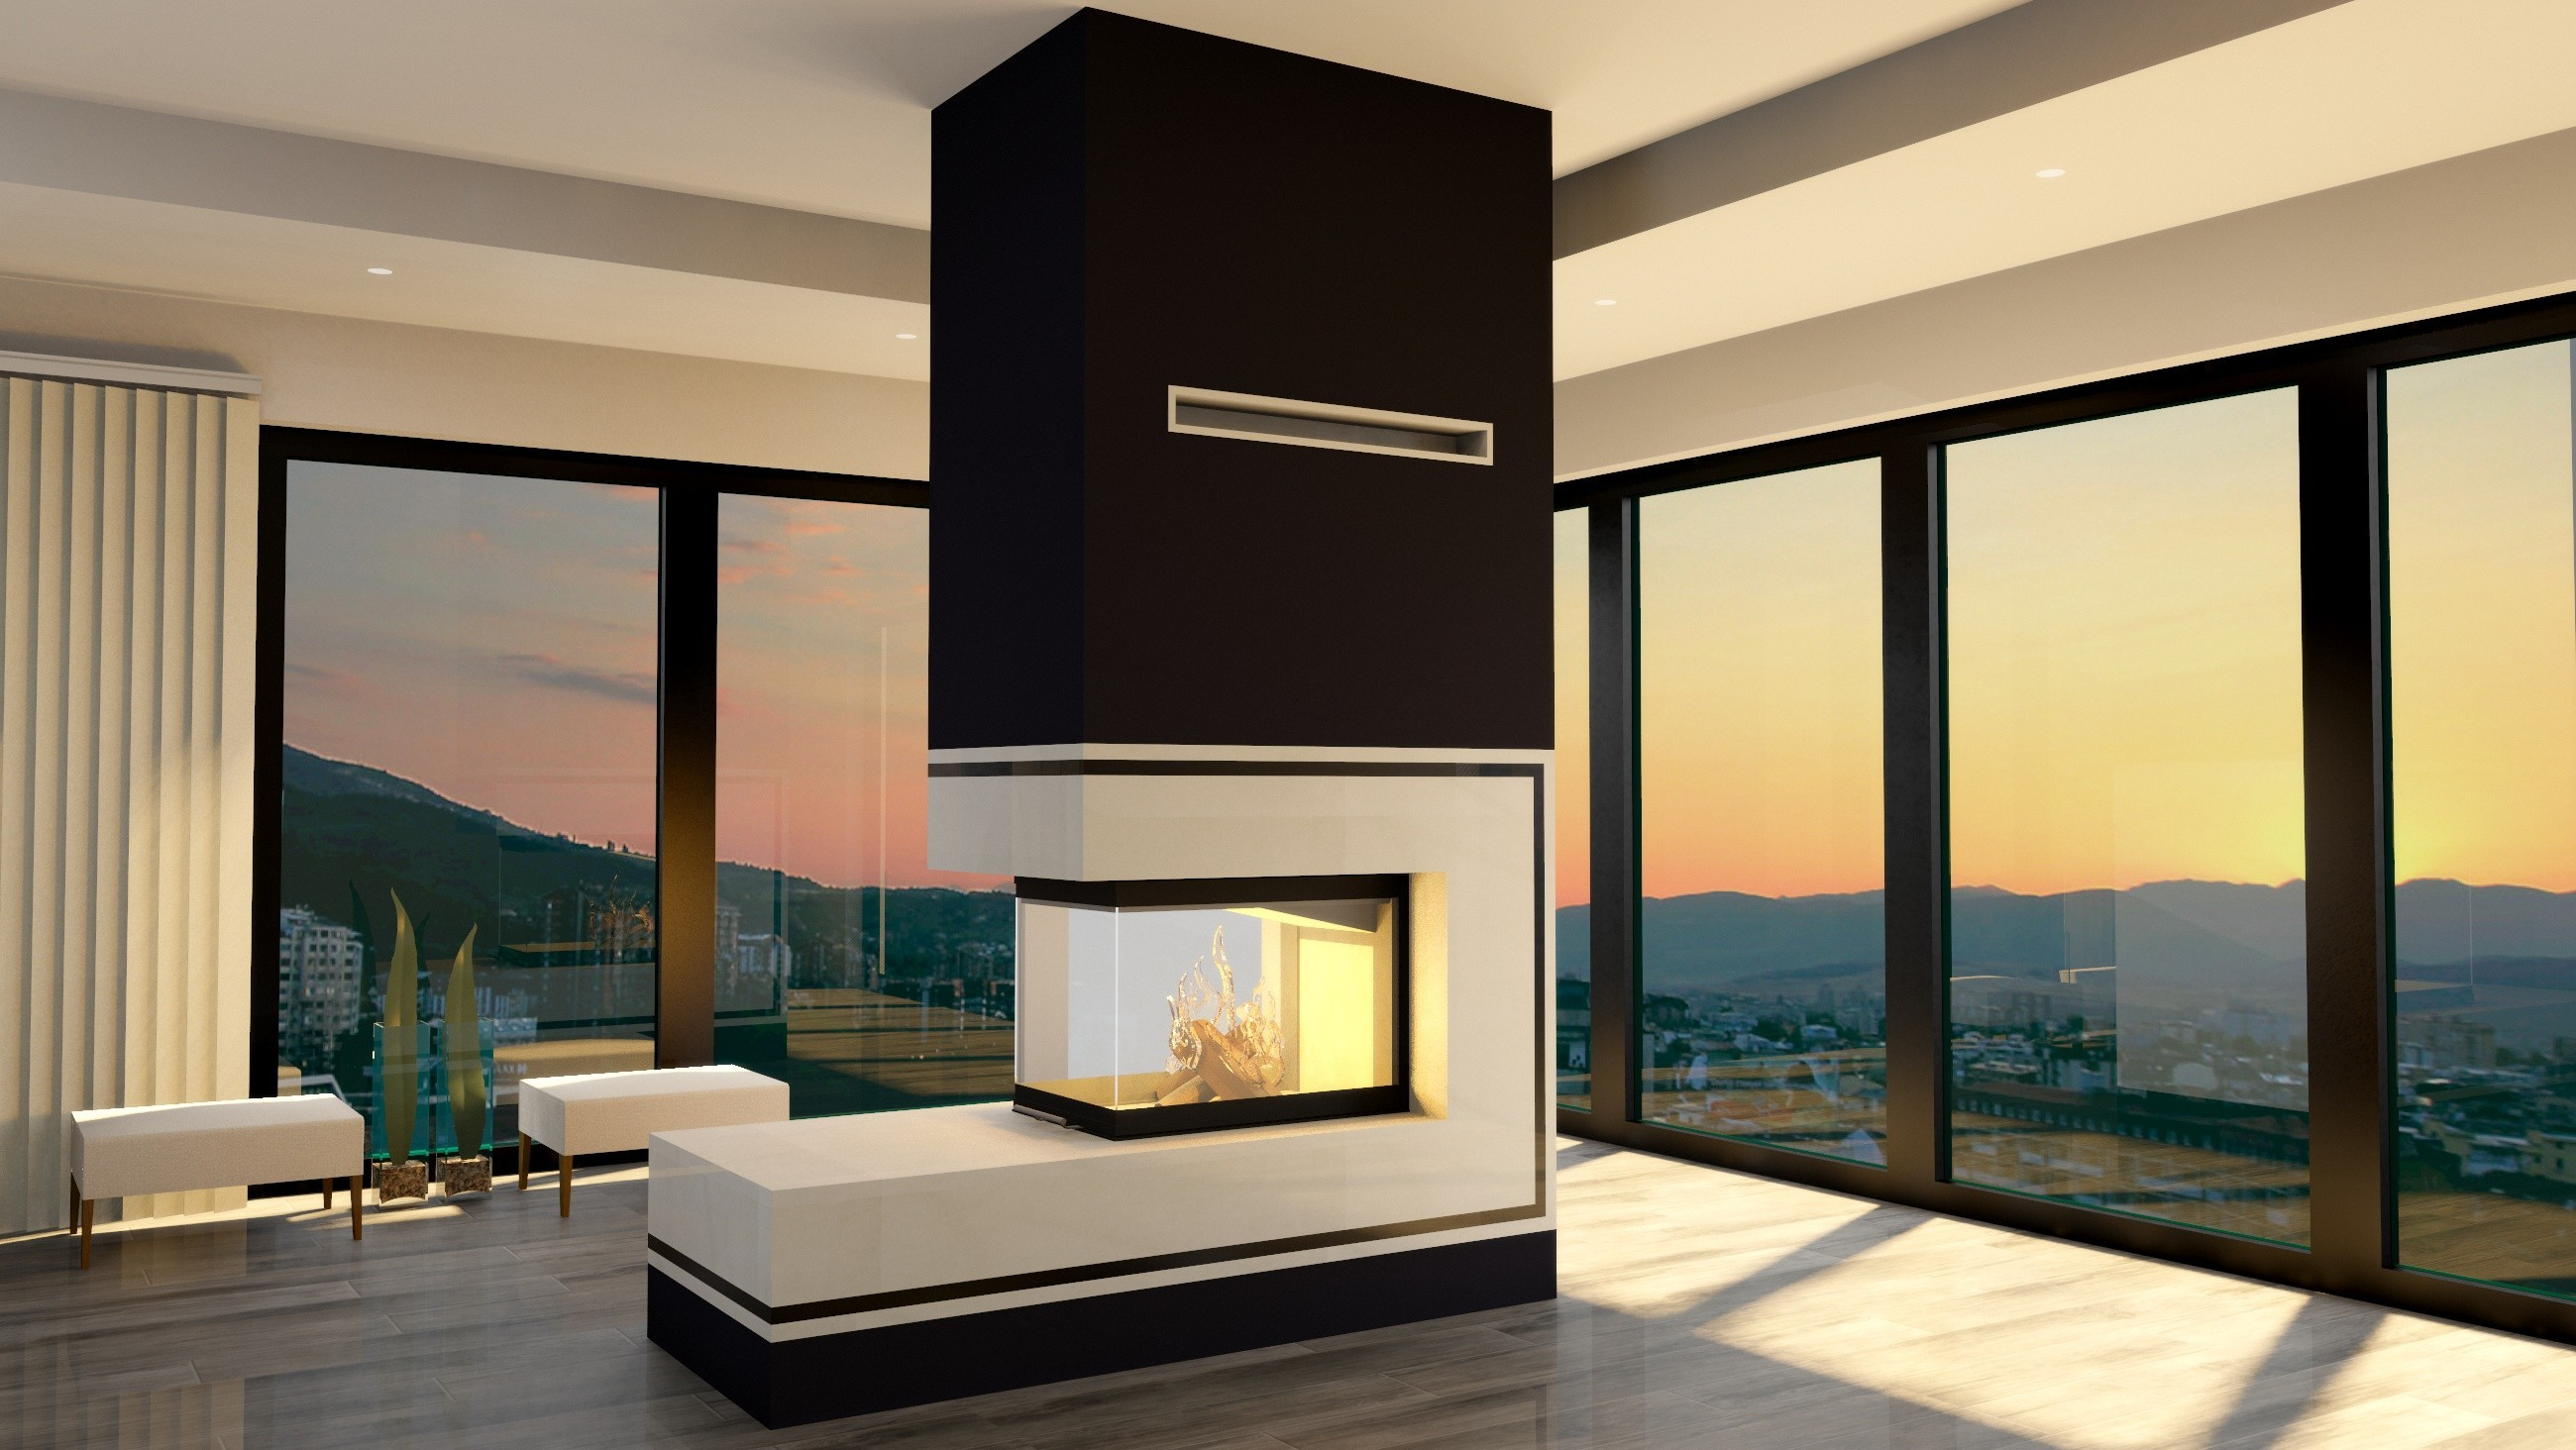 eleganckie kominki nowoczesne hajduk. Black Bedroom Furniture Sets. Home Design Ideas